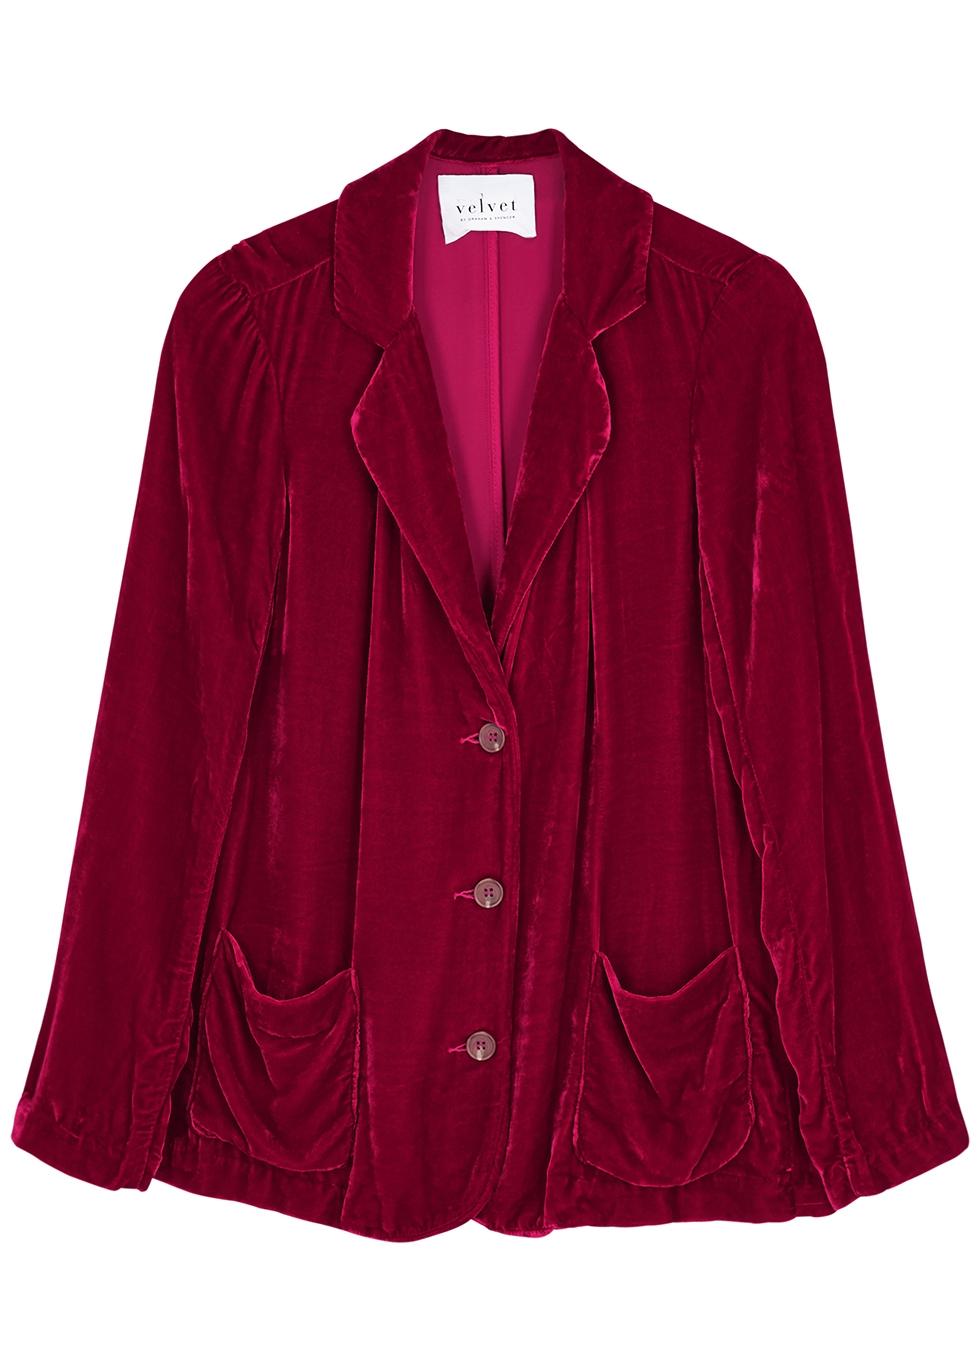 Rayna red velvet blazer